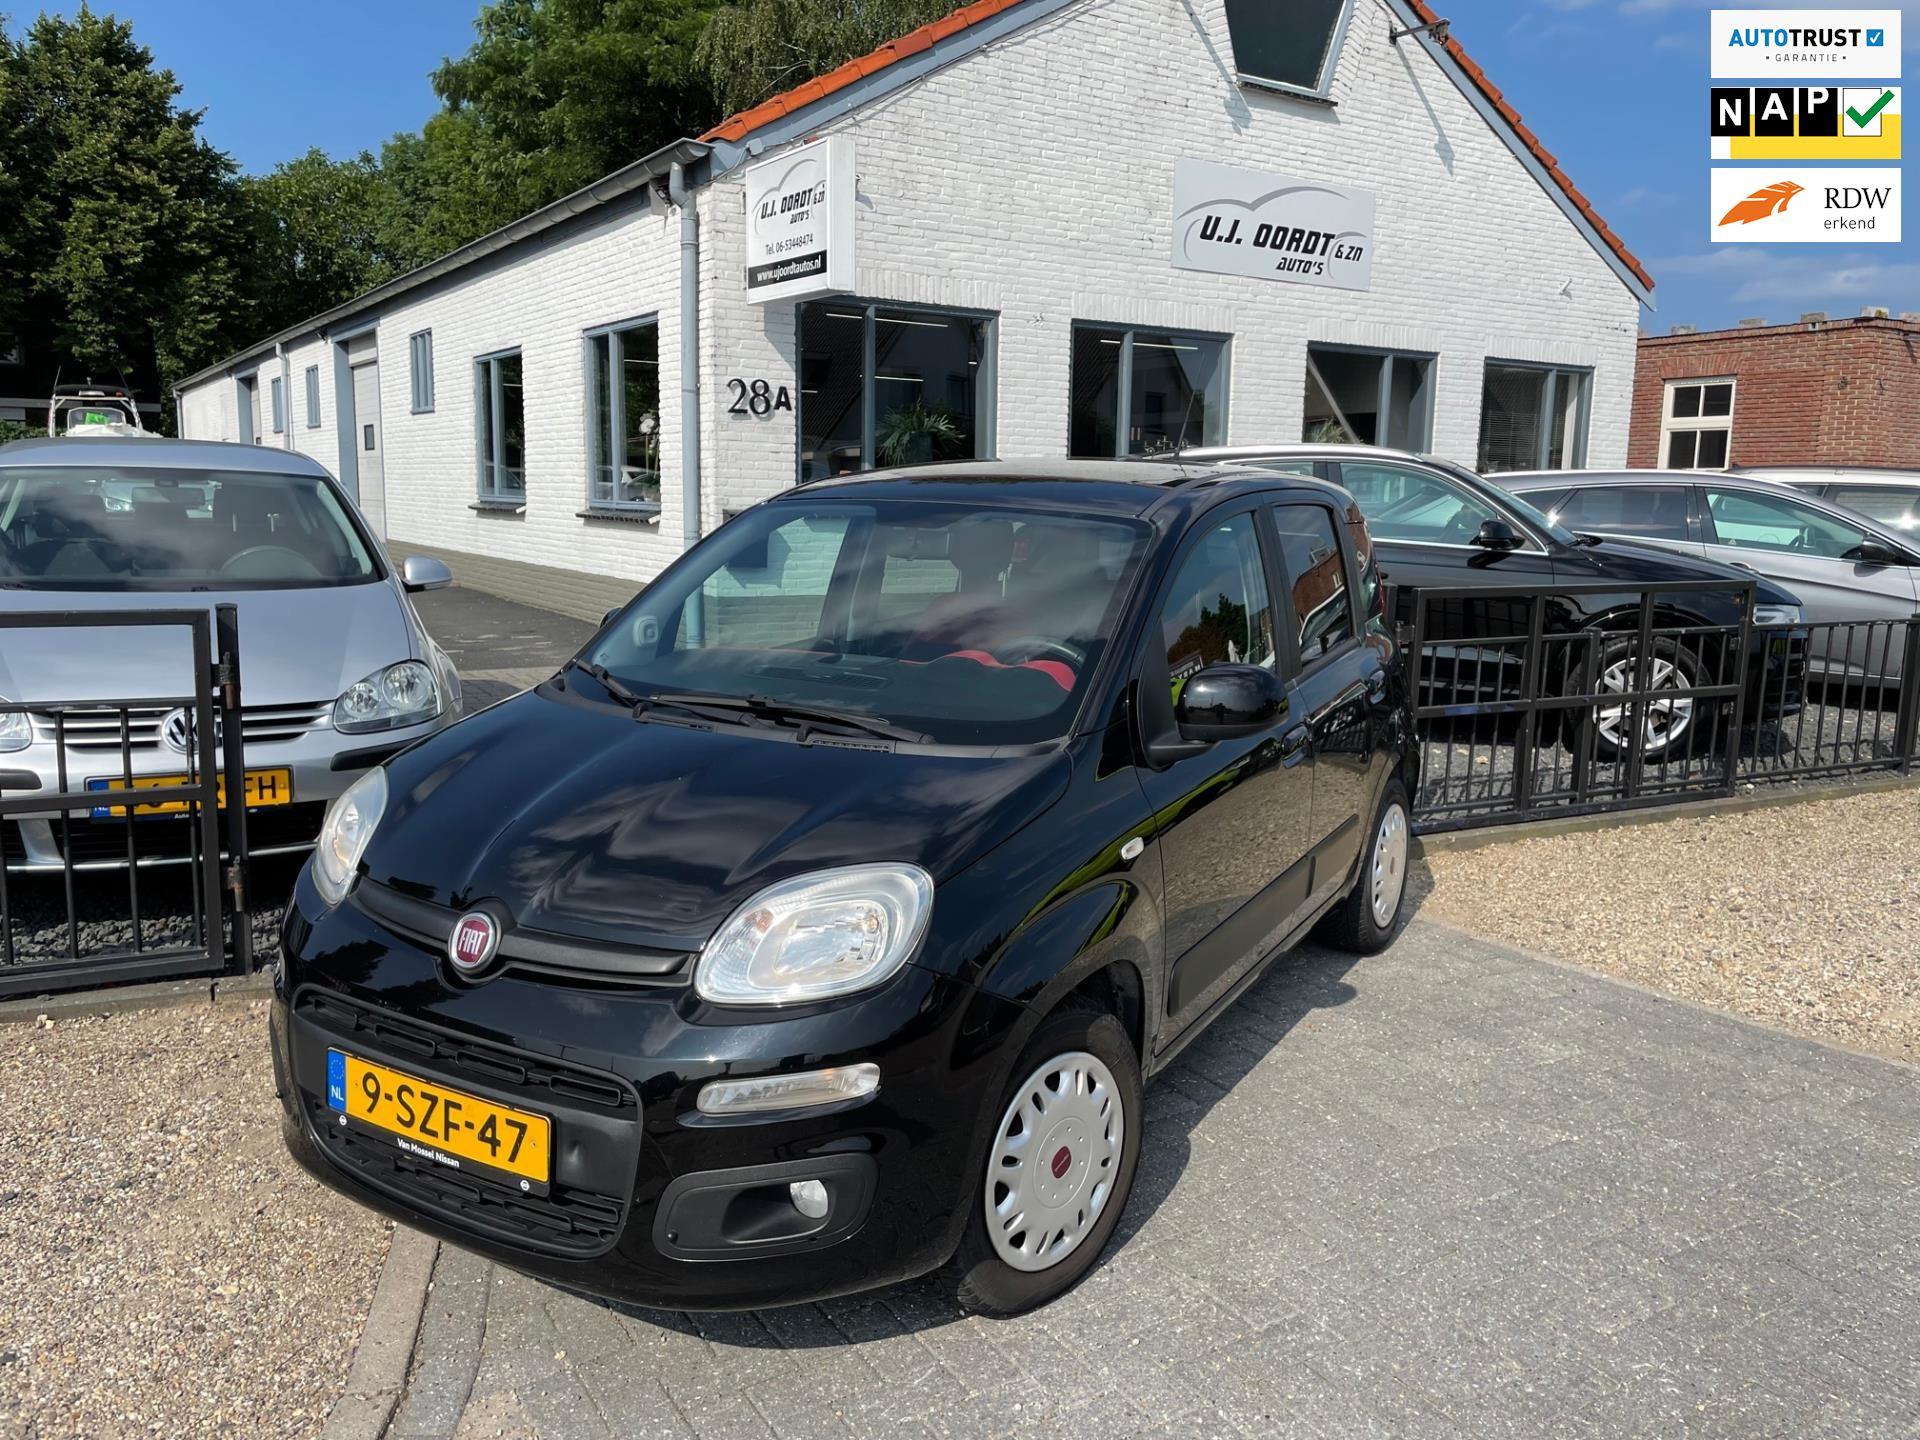 Fiat Panda occasion - U.J. Oordt Auto's